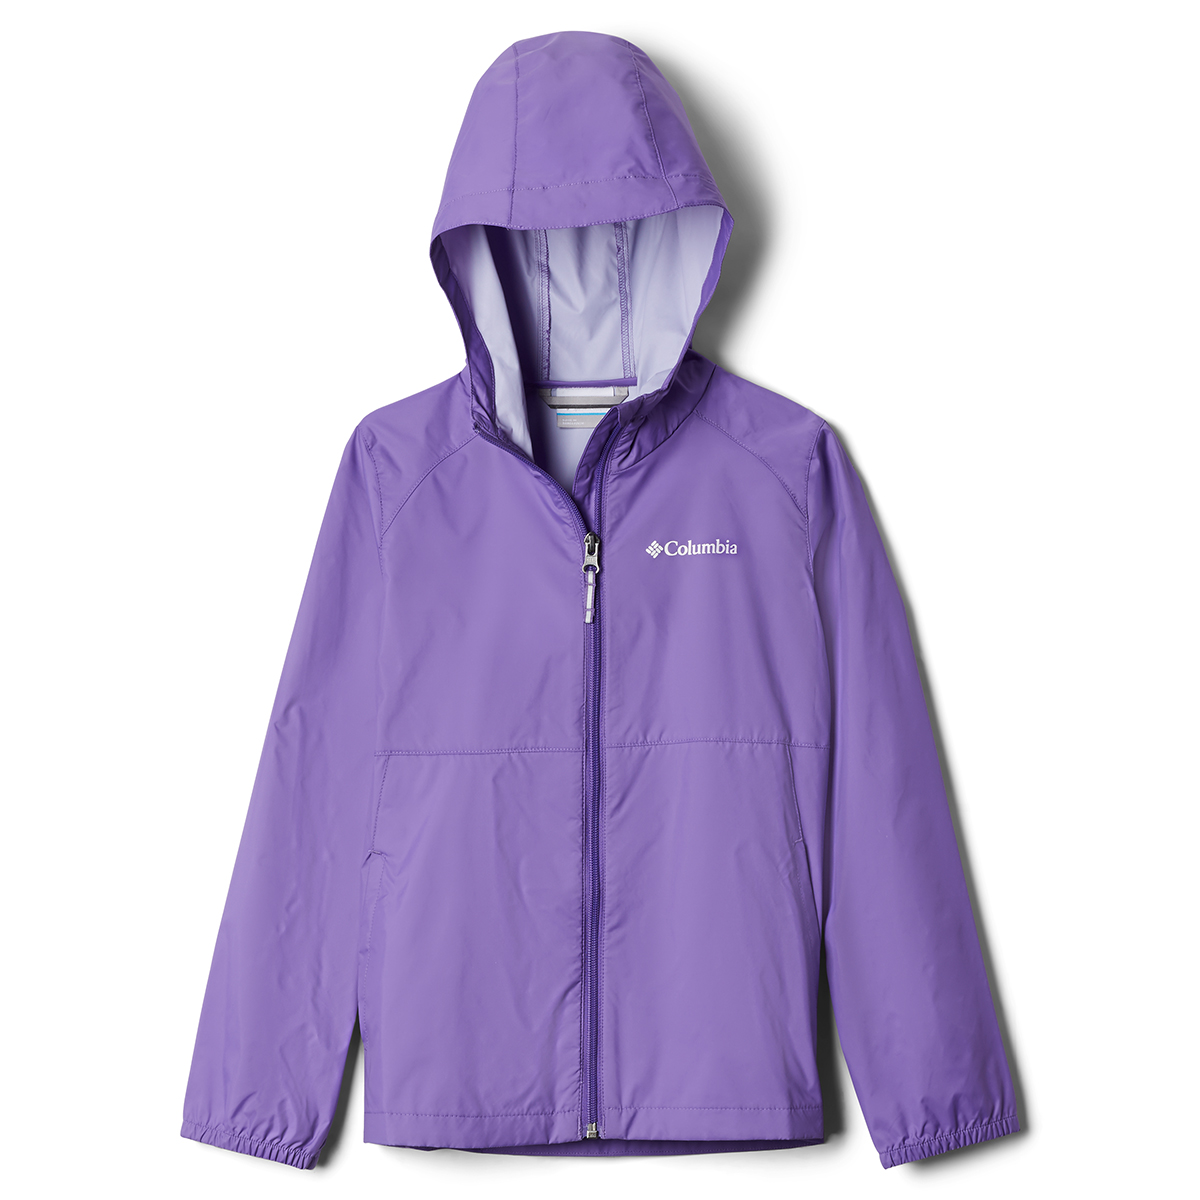 Columbia Girls' Switchback 2 Jacket - Purple, M